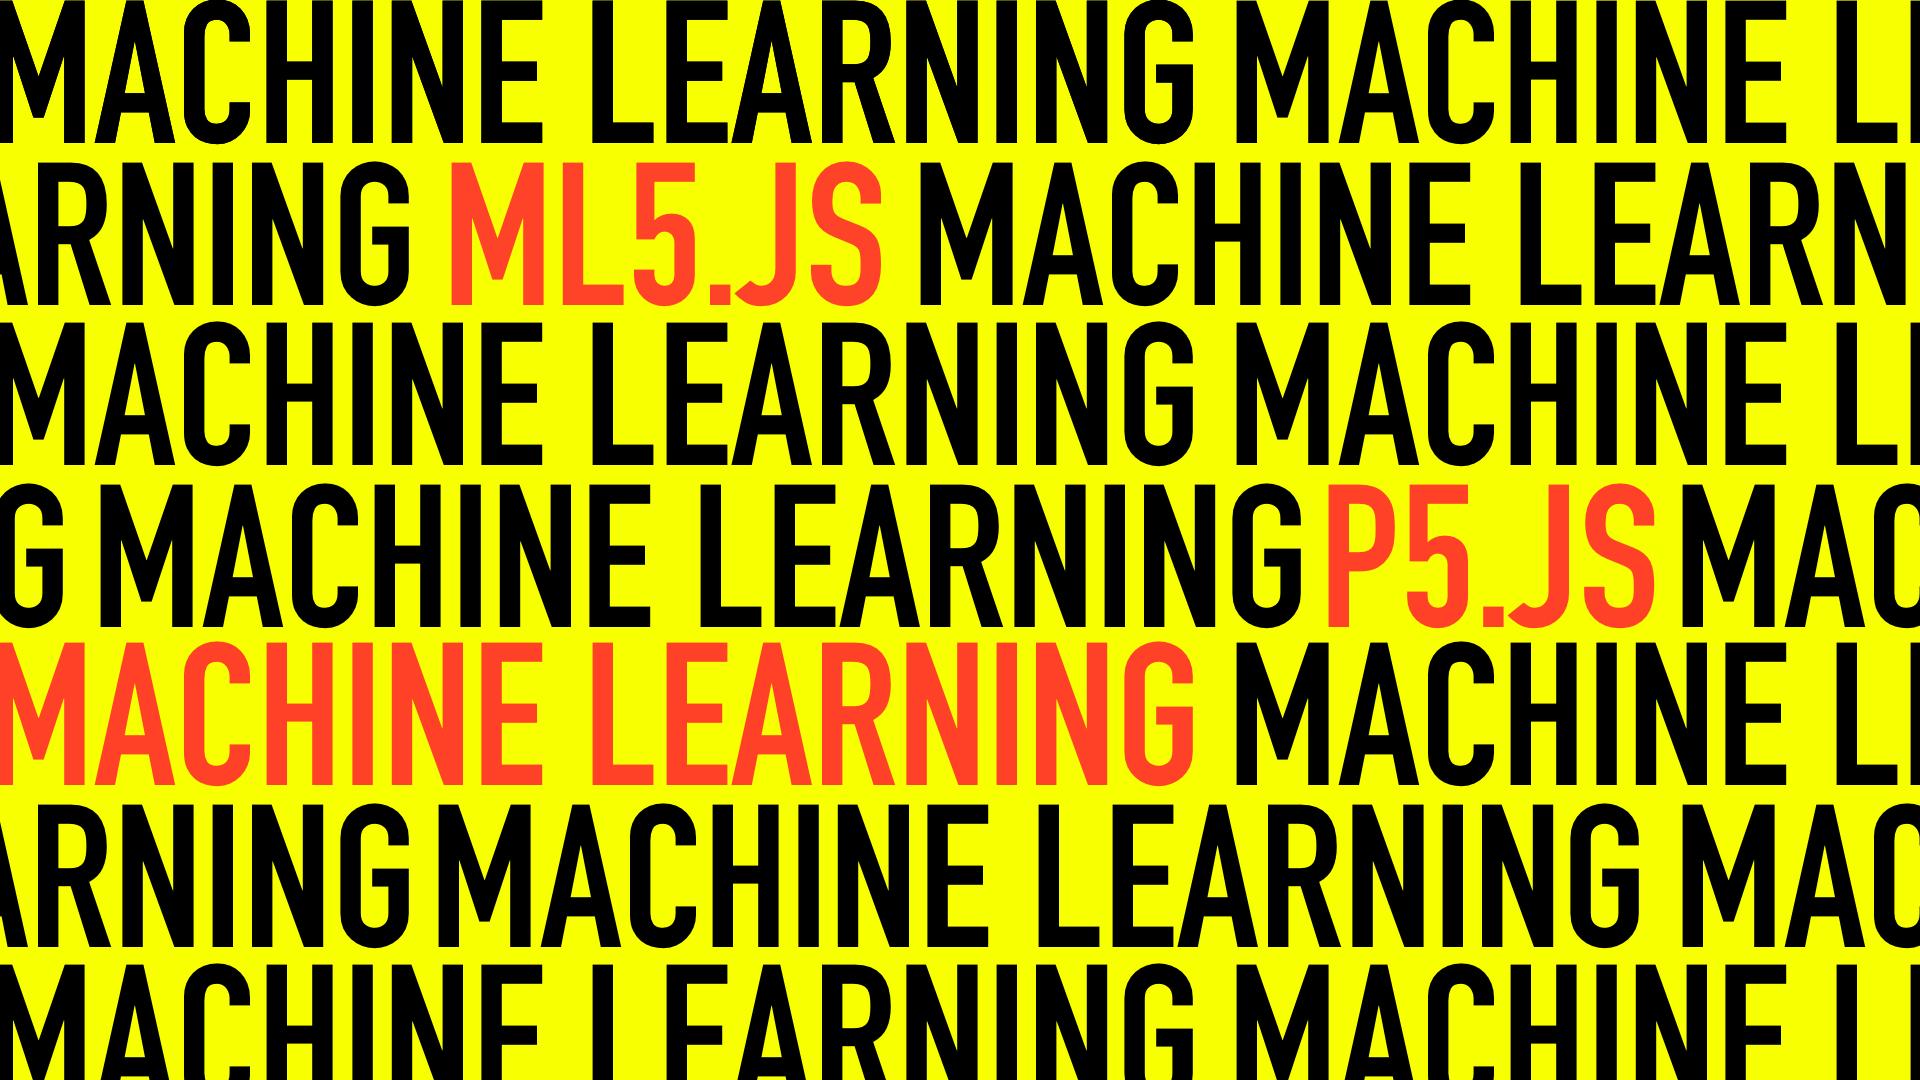 alsino skowronnek Creative Applications of Machine Learning – A Hands-On Workshop for (Absolute) Beginners